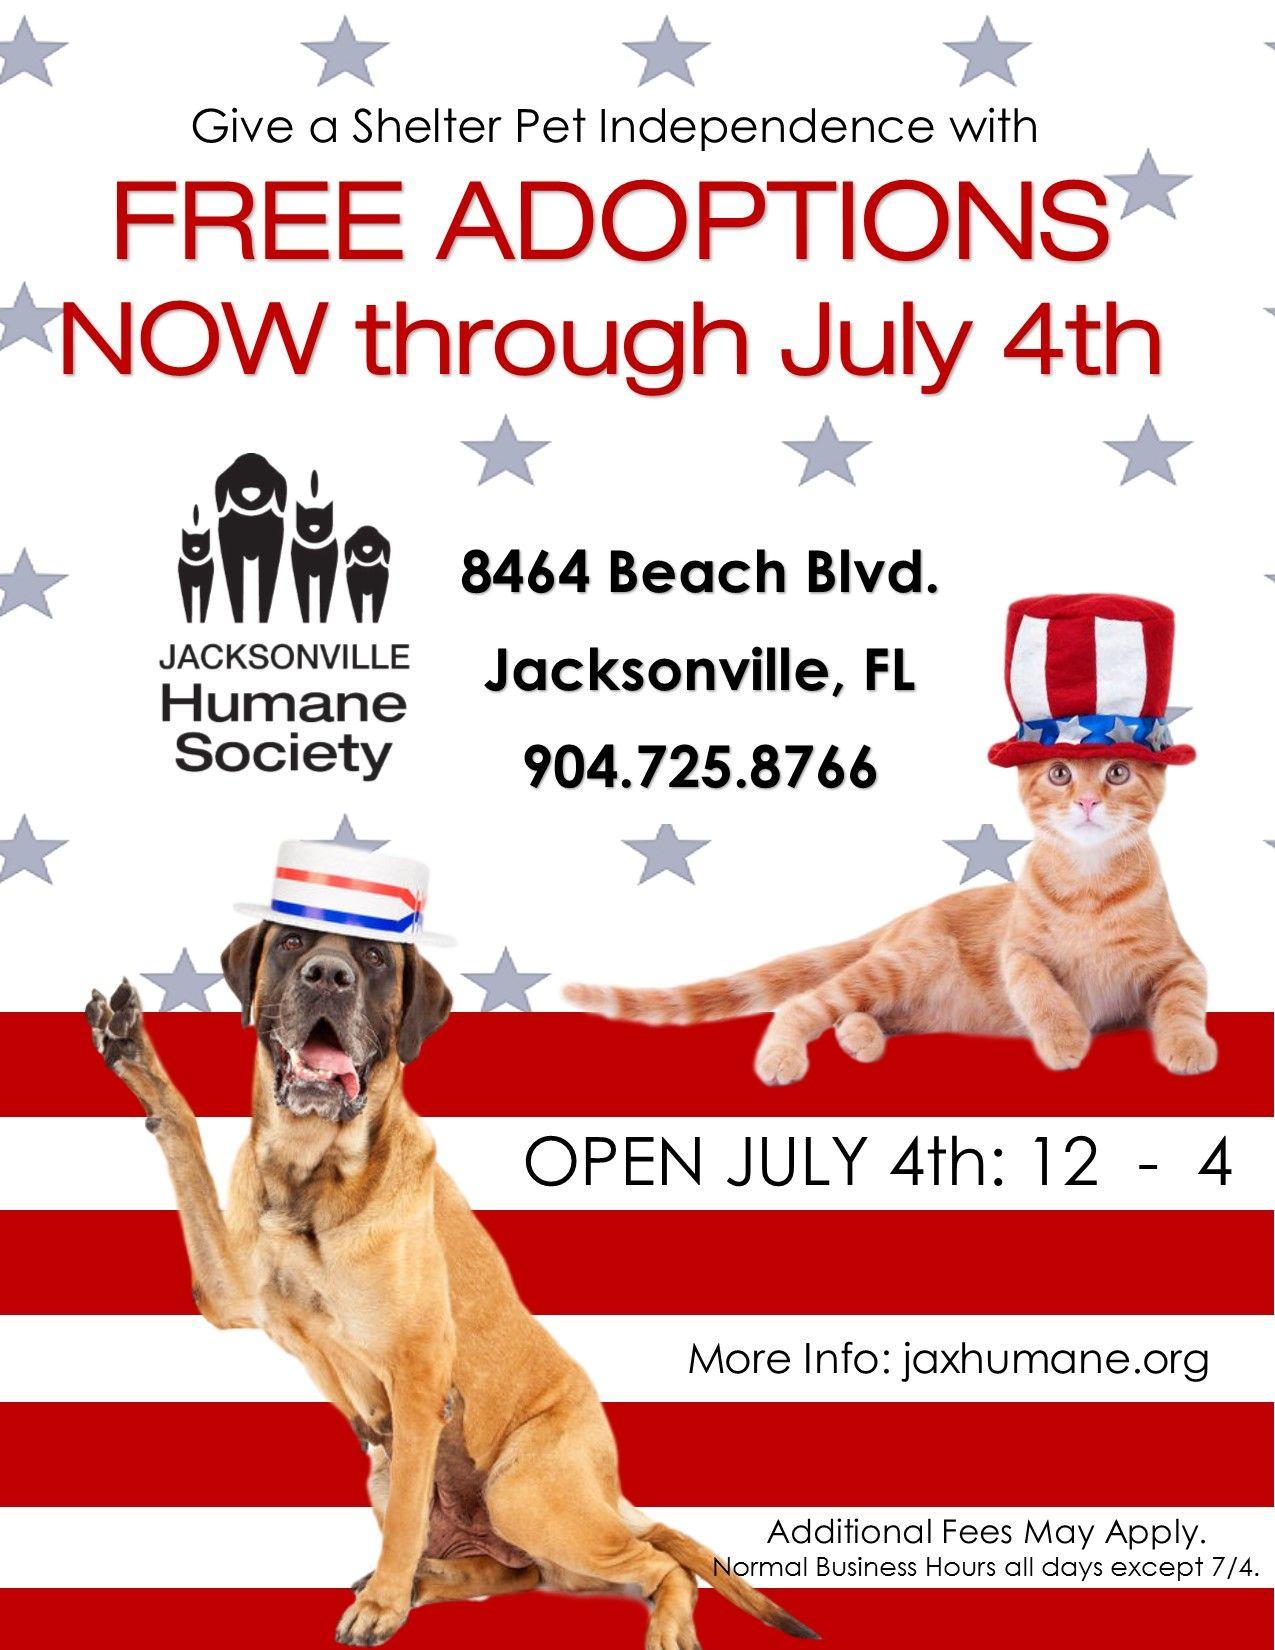 Jacksonville Humane Society FREE ADOPTIONS NOW thru JULY